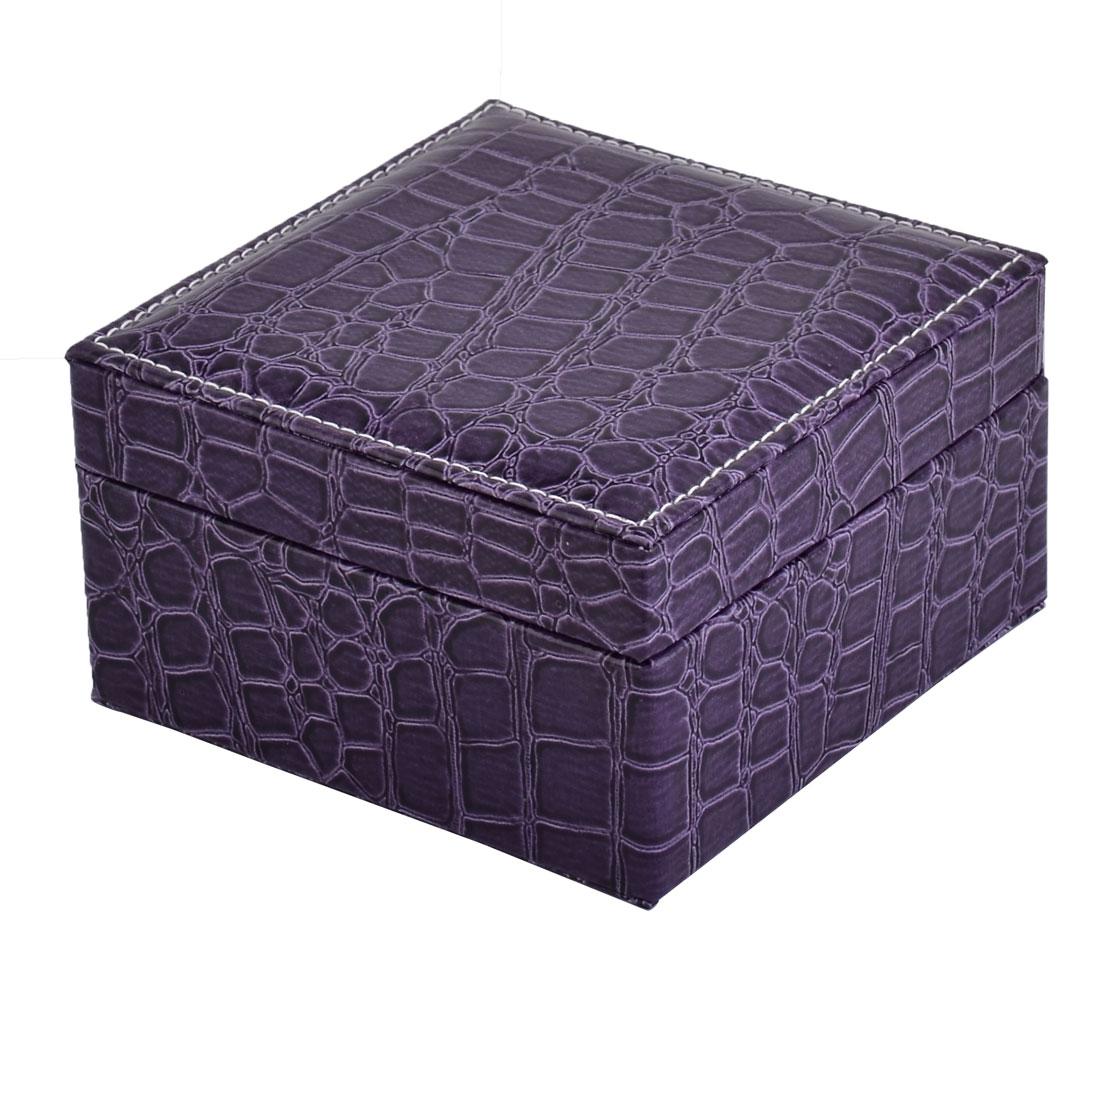 Home Travel Cosmetics Jewelry Bead Display Case Holder Storage Box Casket Purple